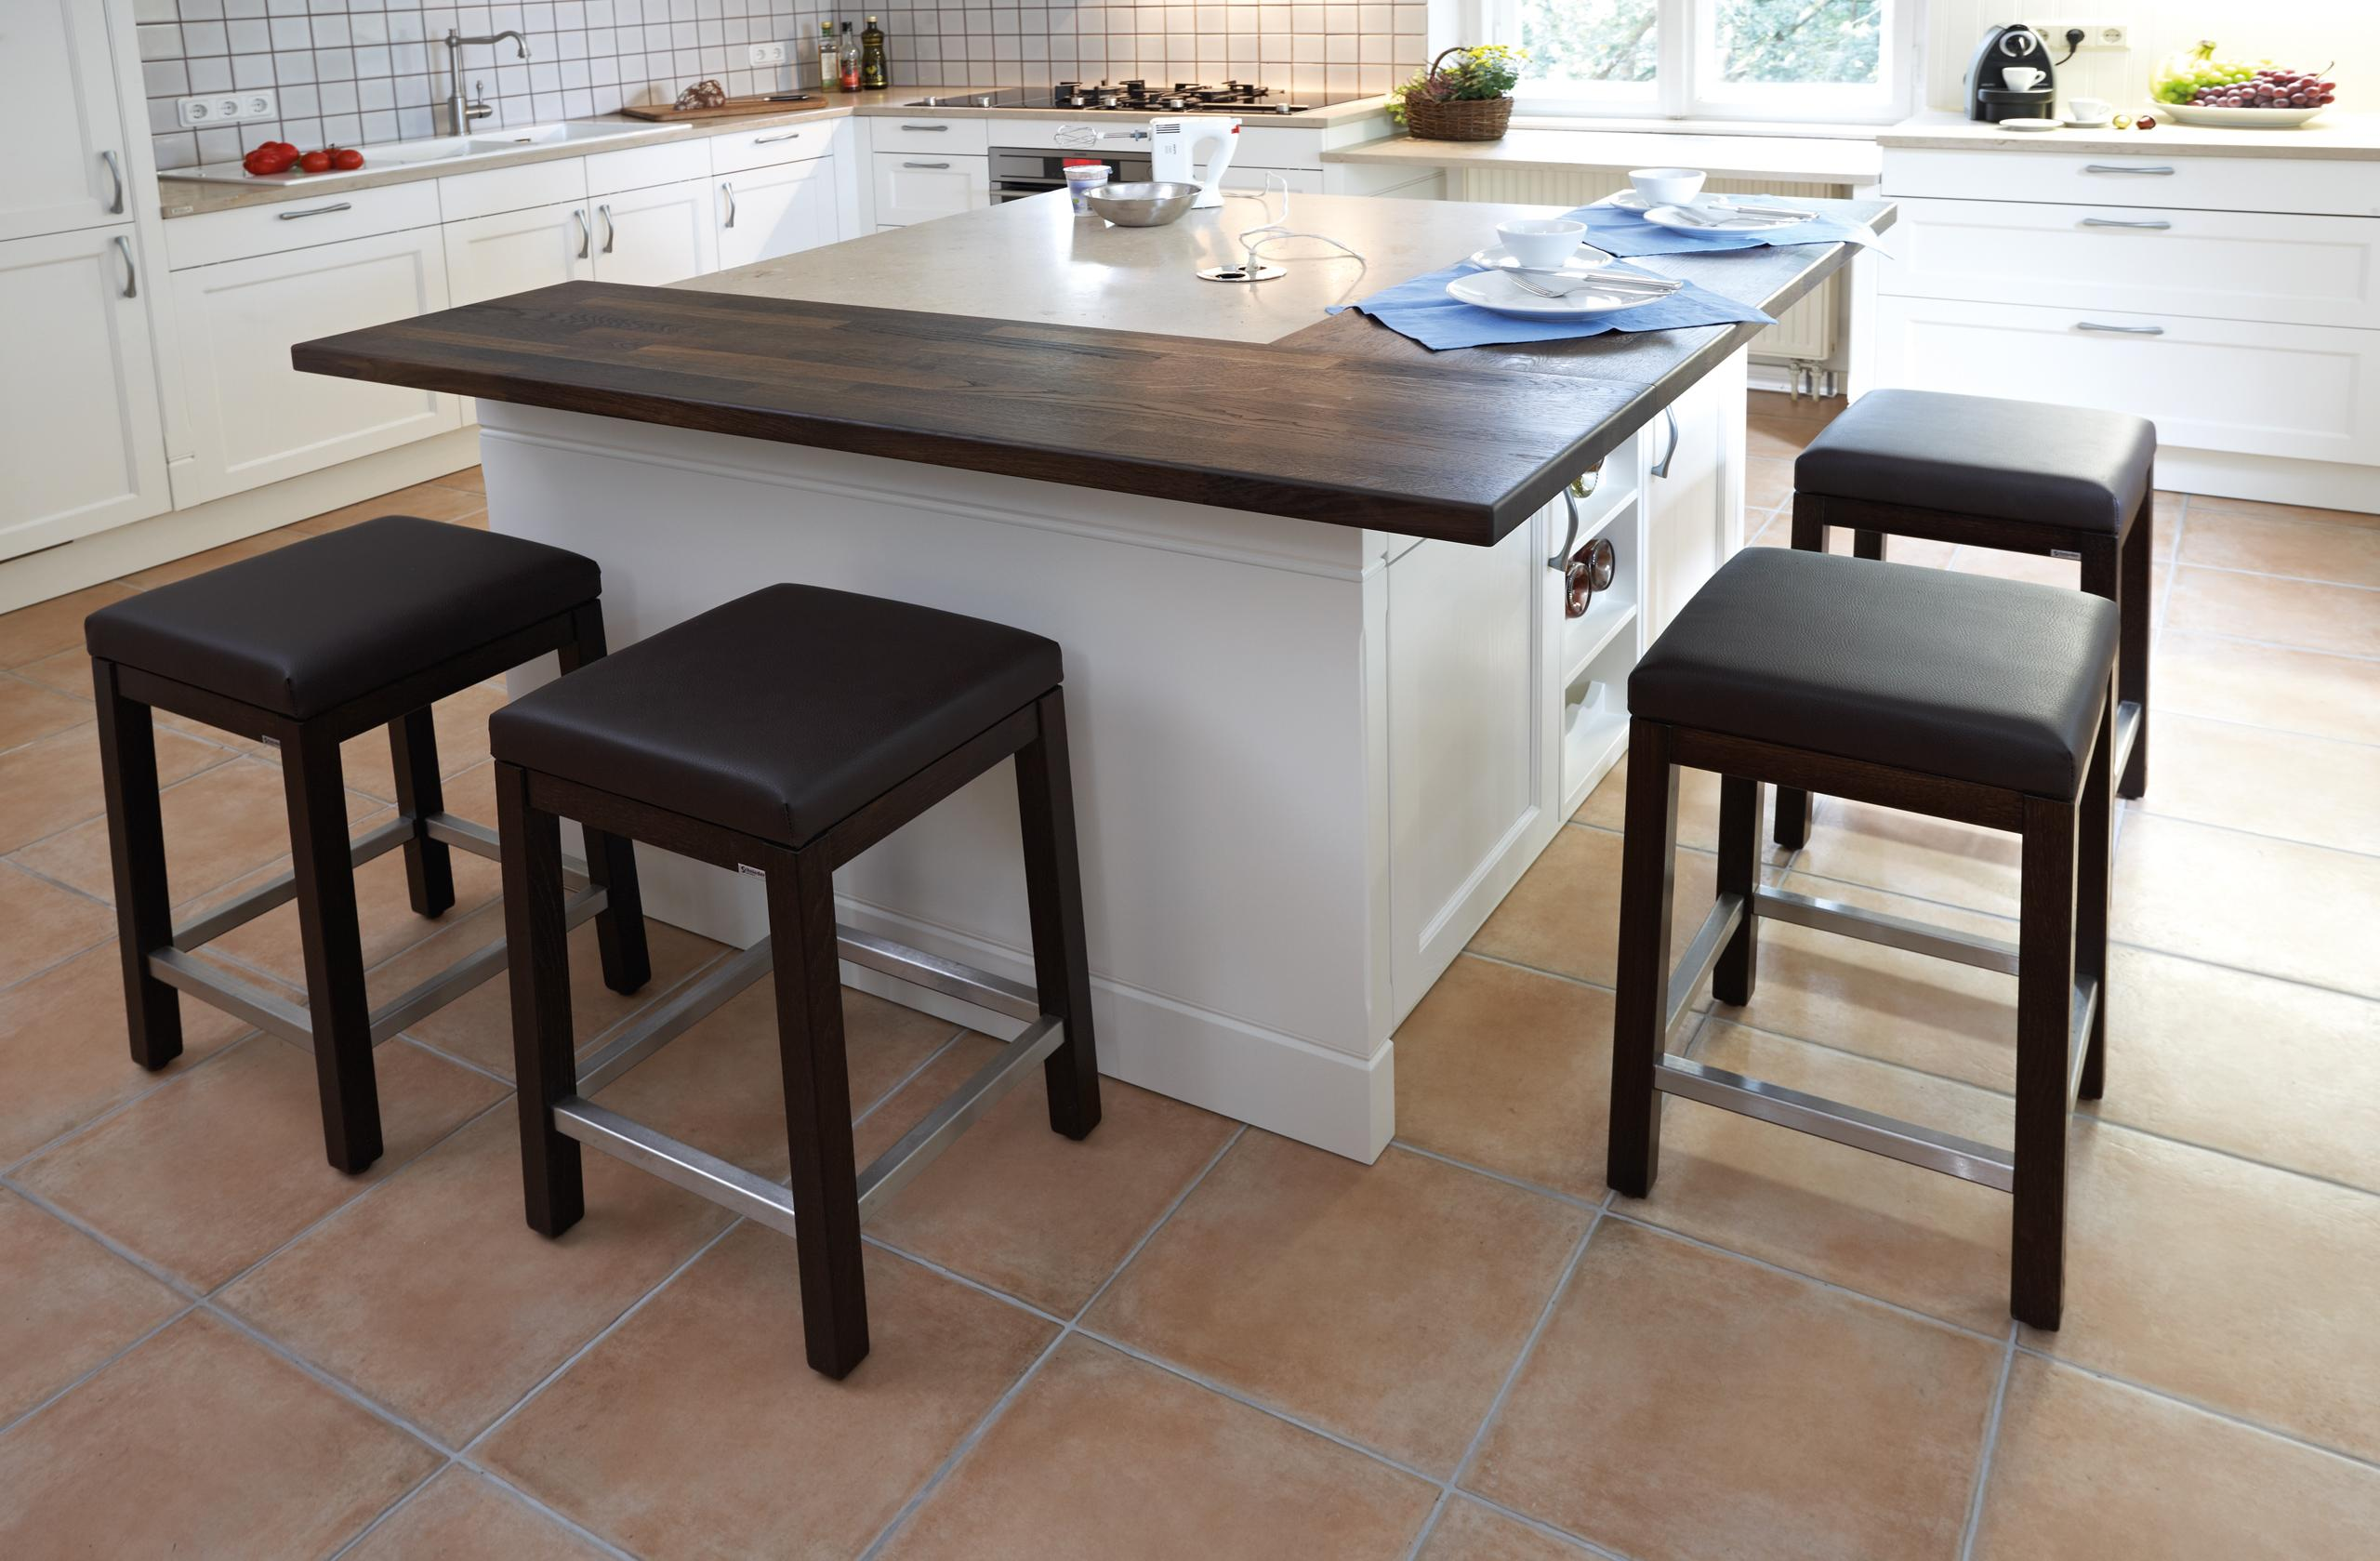 esstheke bilder ideen couch. Black Bedroom Furniture Sets. Home Design Ideas